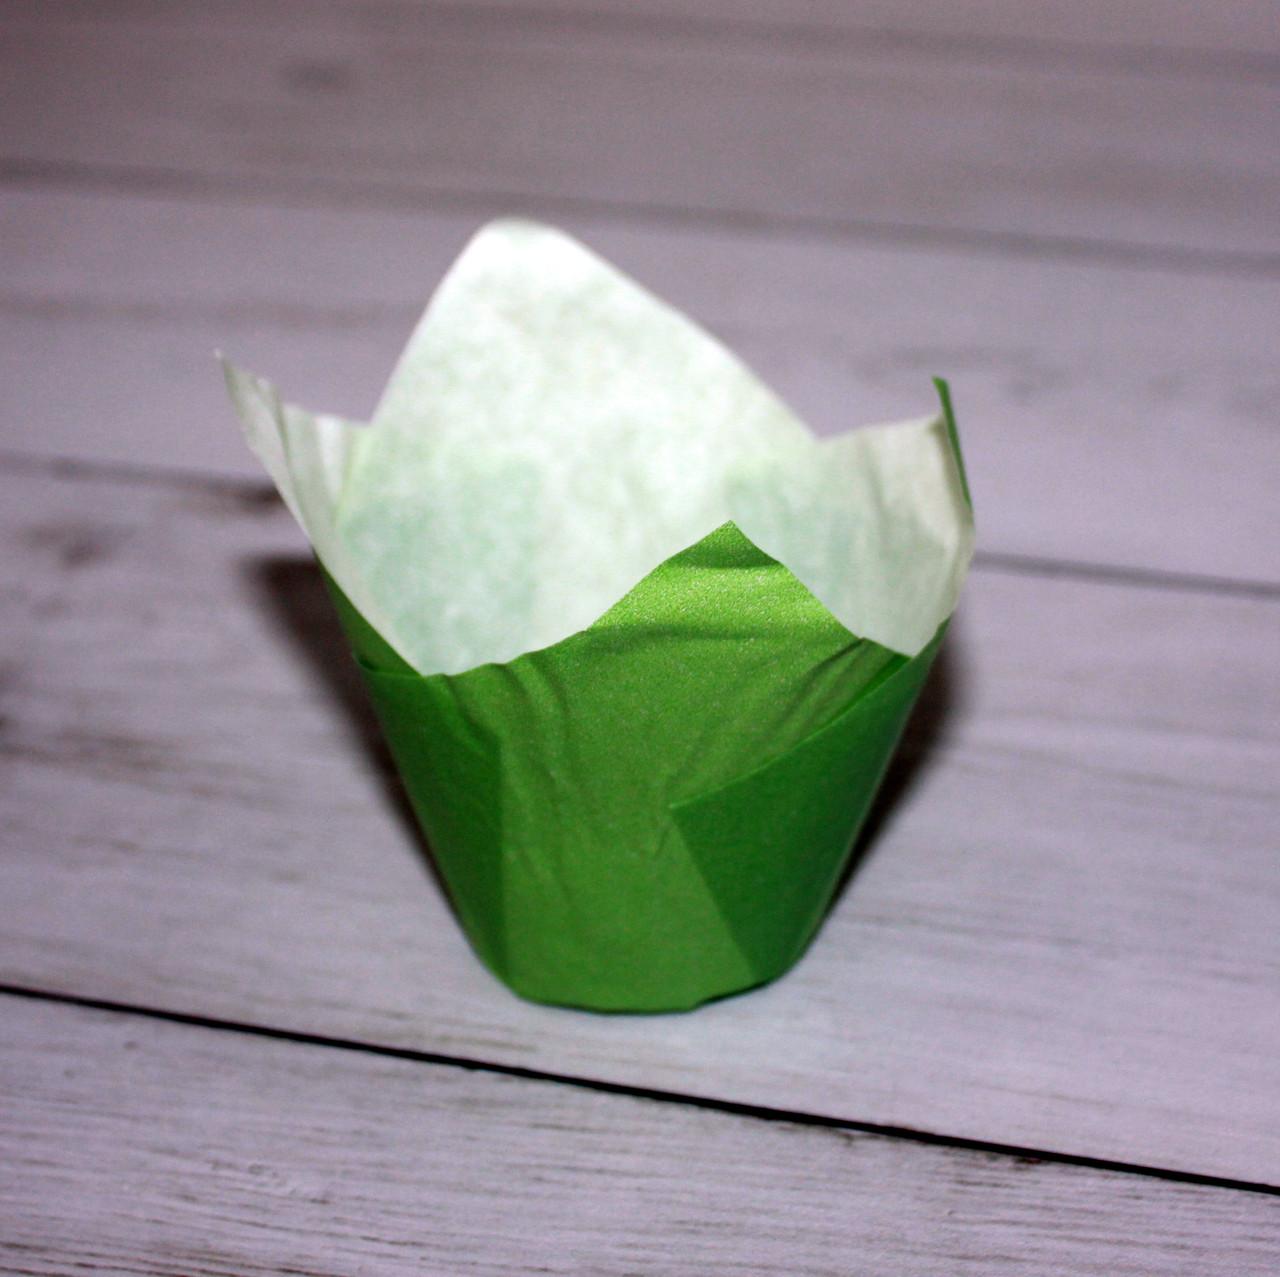 Бумажные тюльпаны для выпечки зеленая